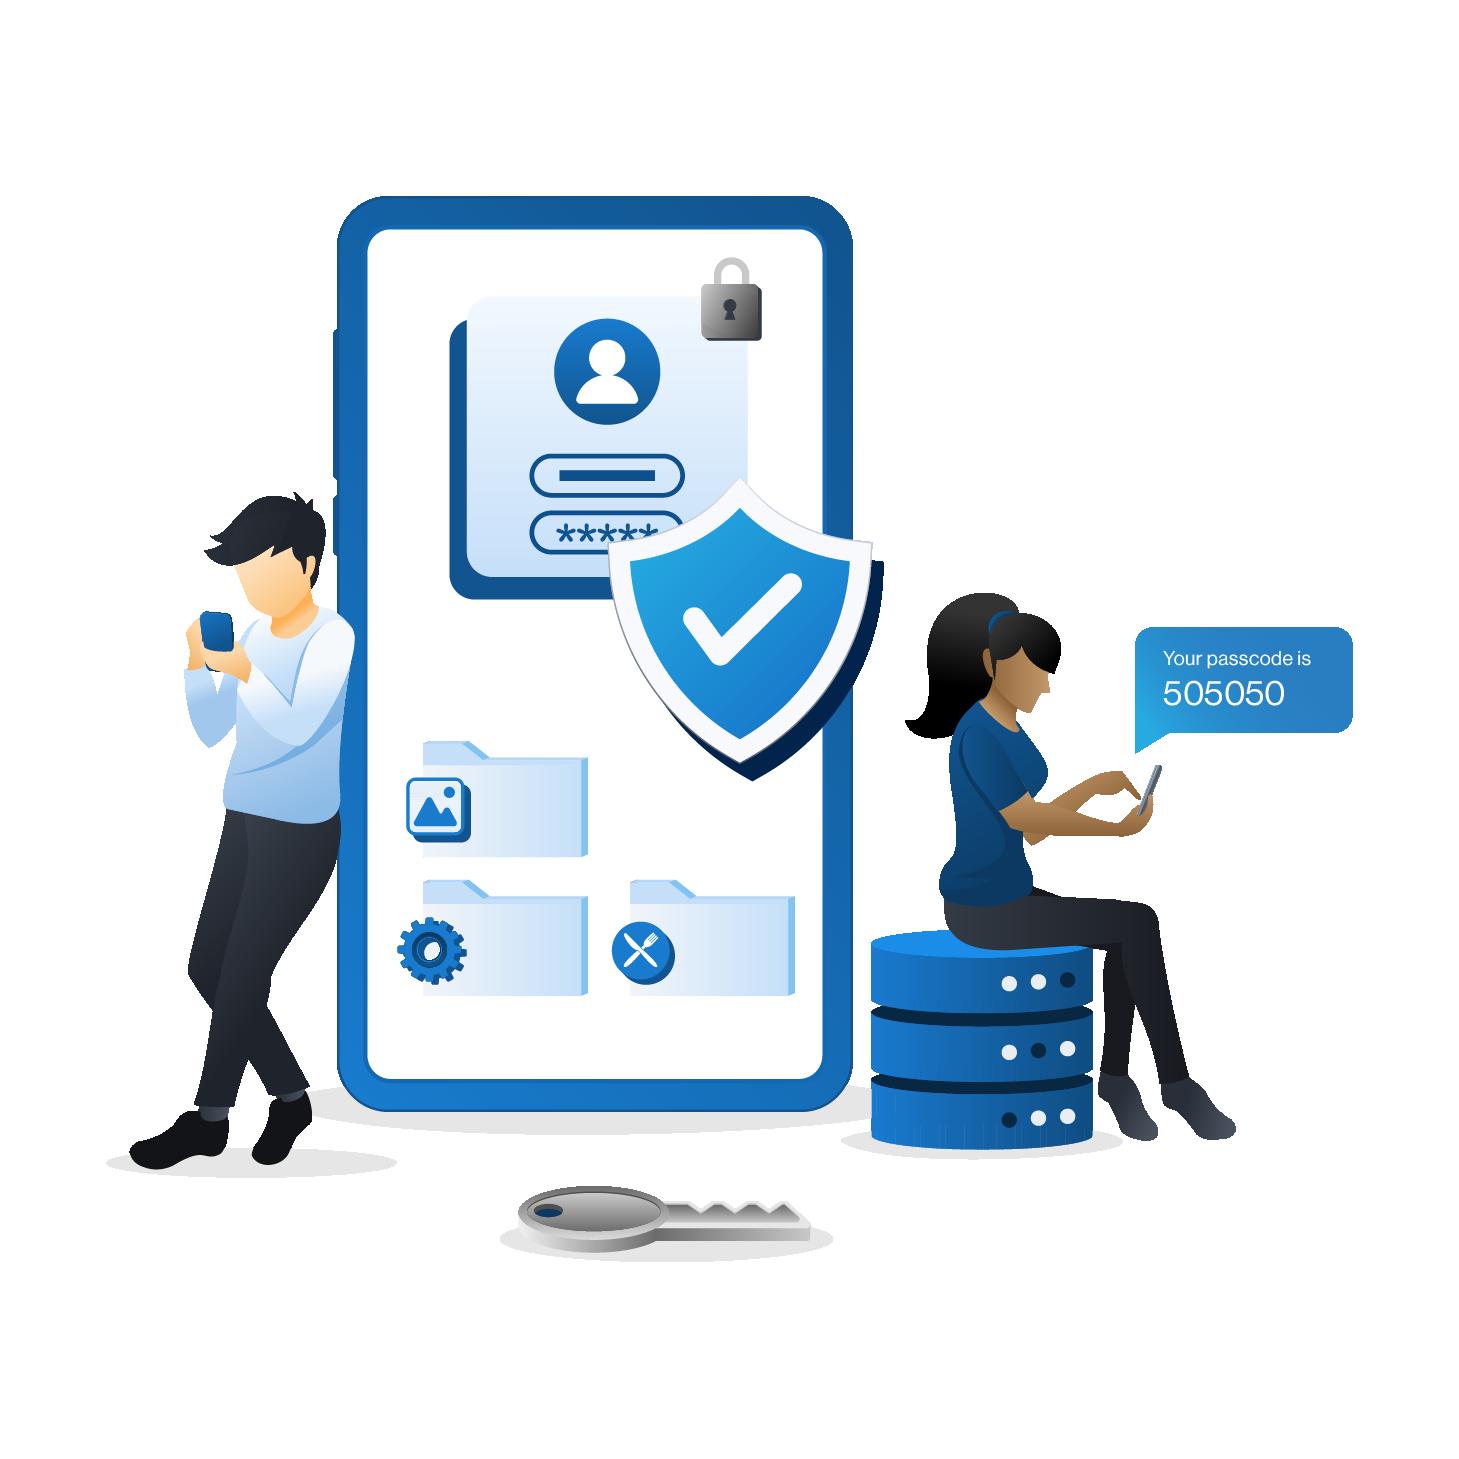 Verification user registrations